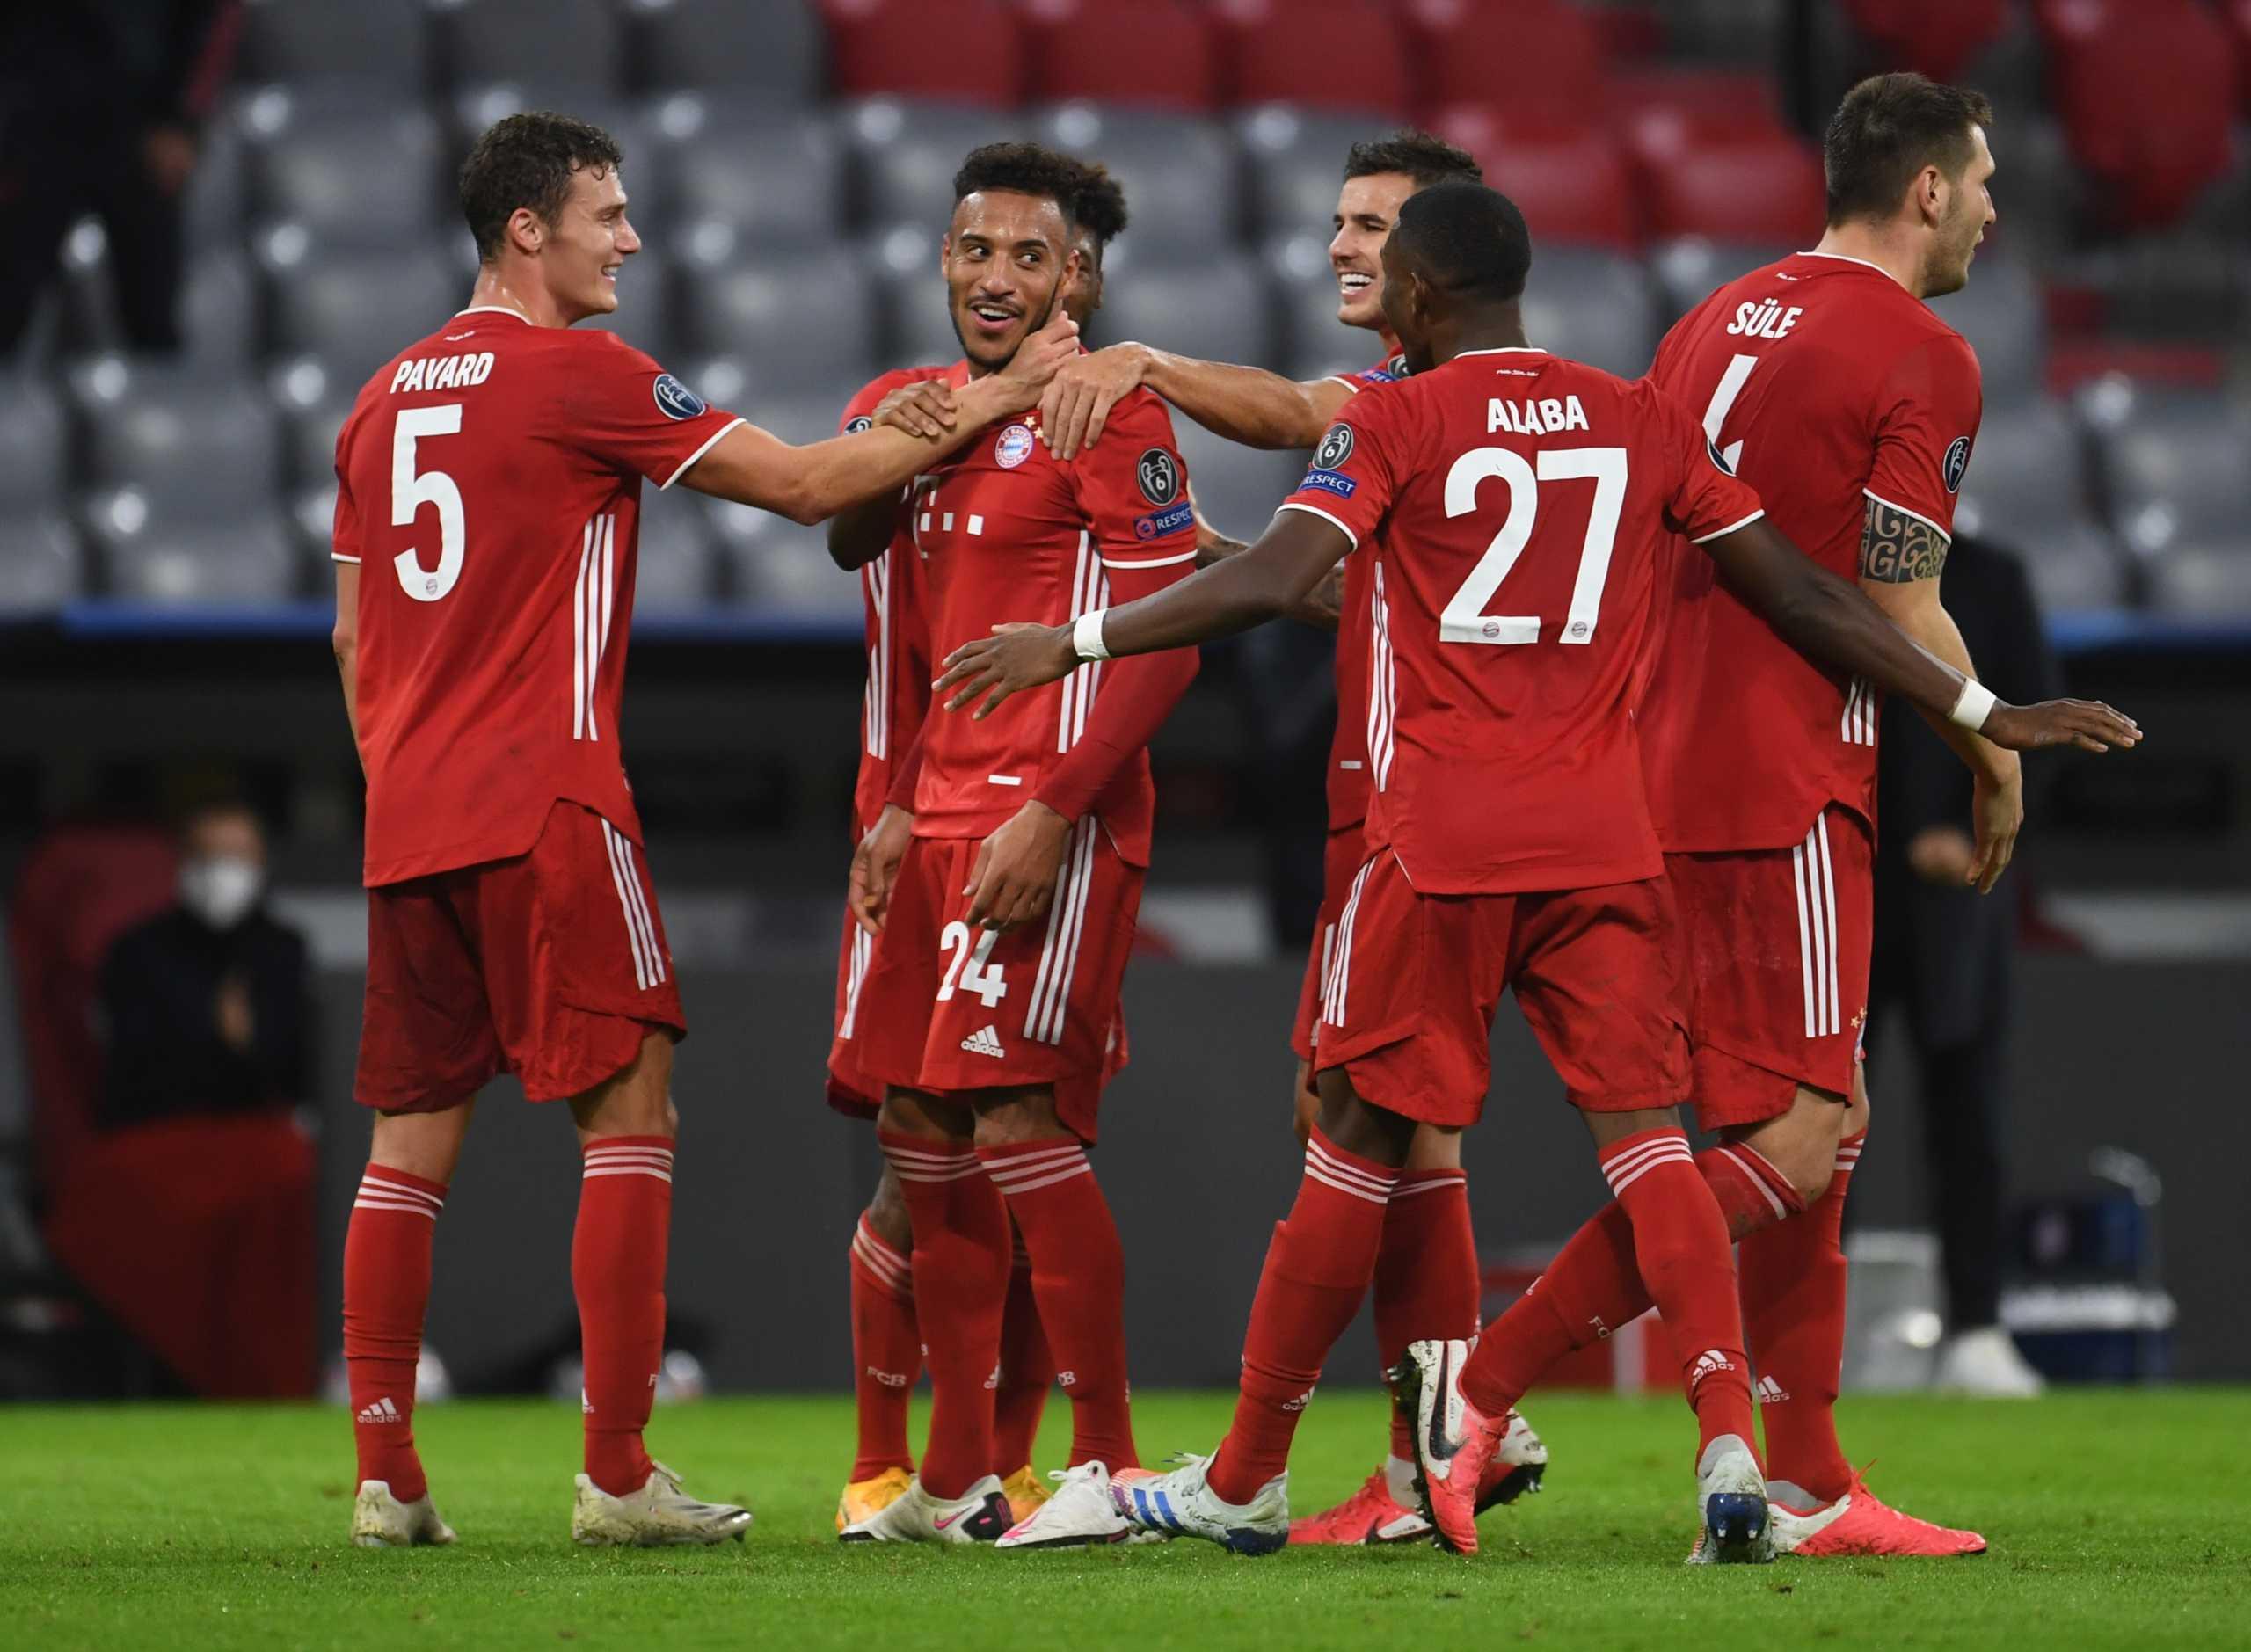 Champions League Μπάγερν Ατλέτικο